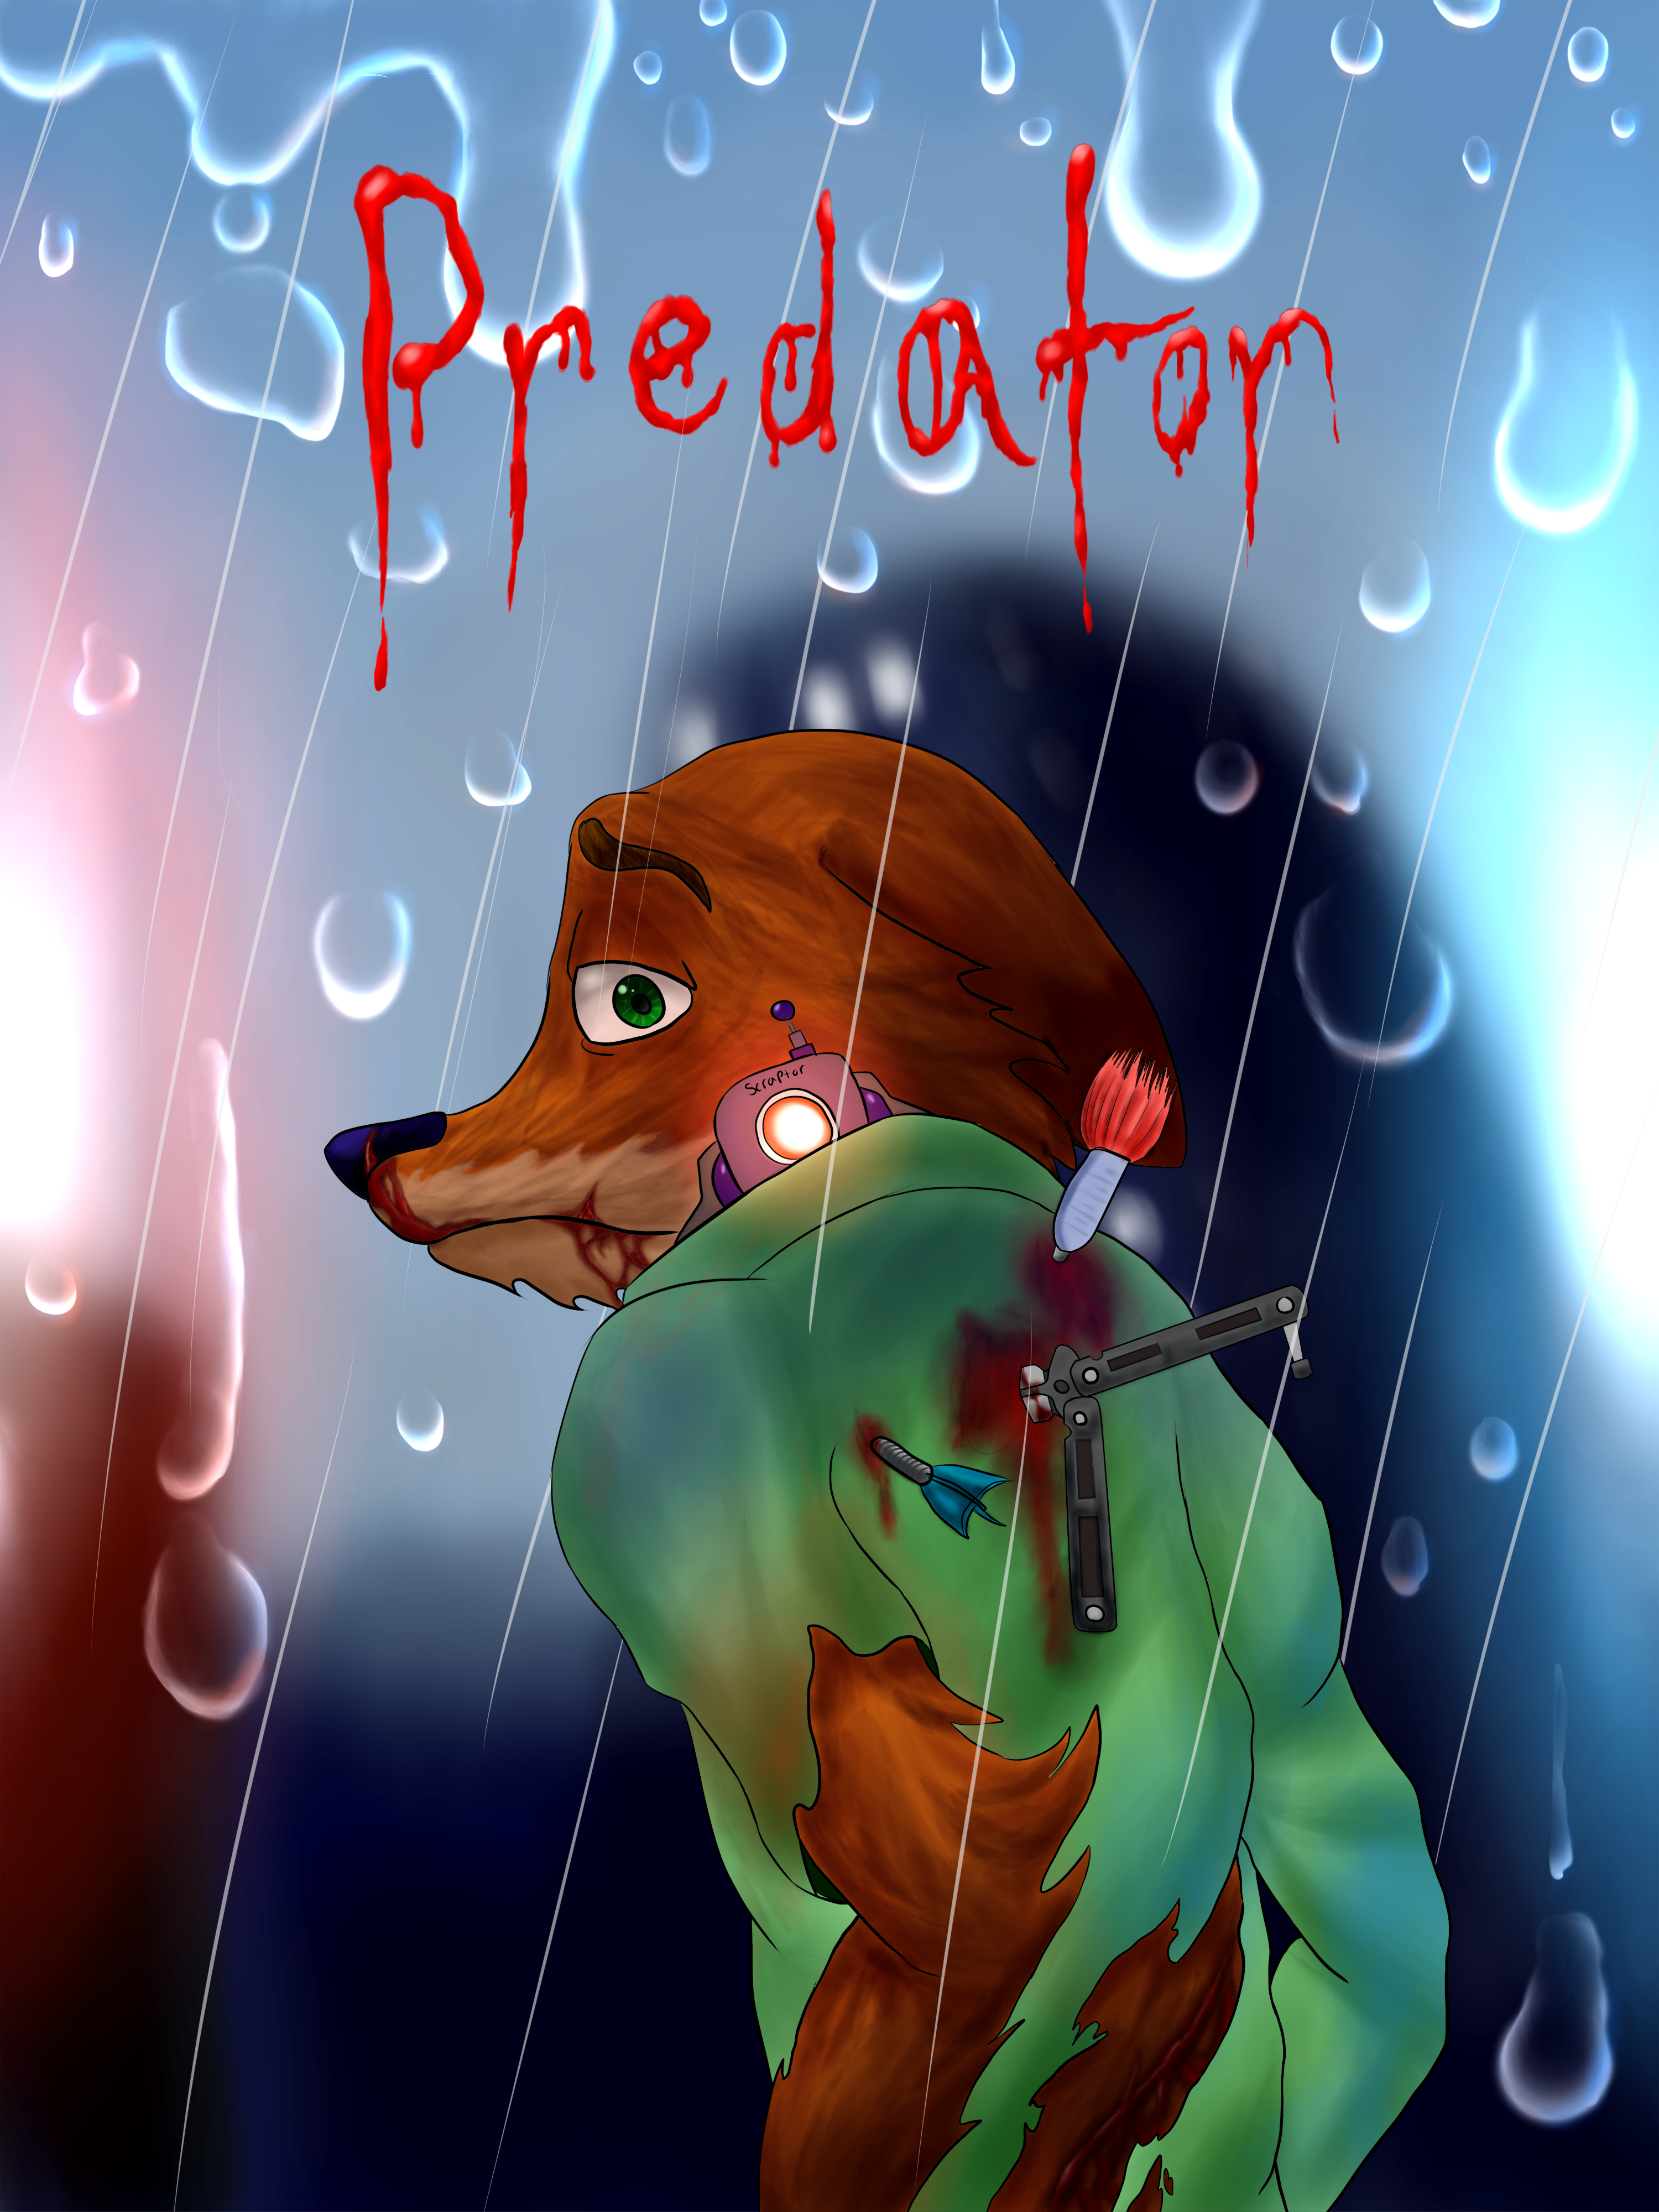 Predator (Zootopia)